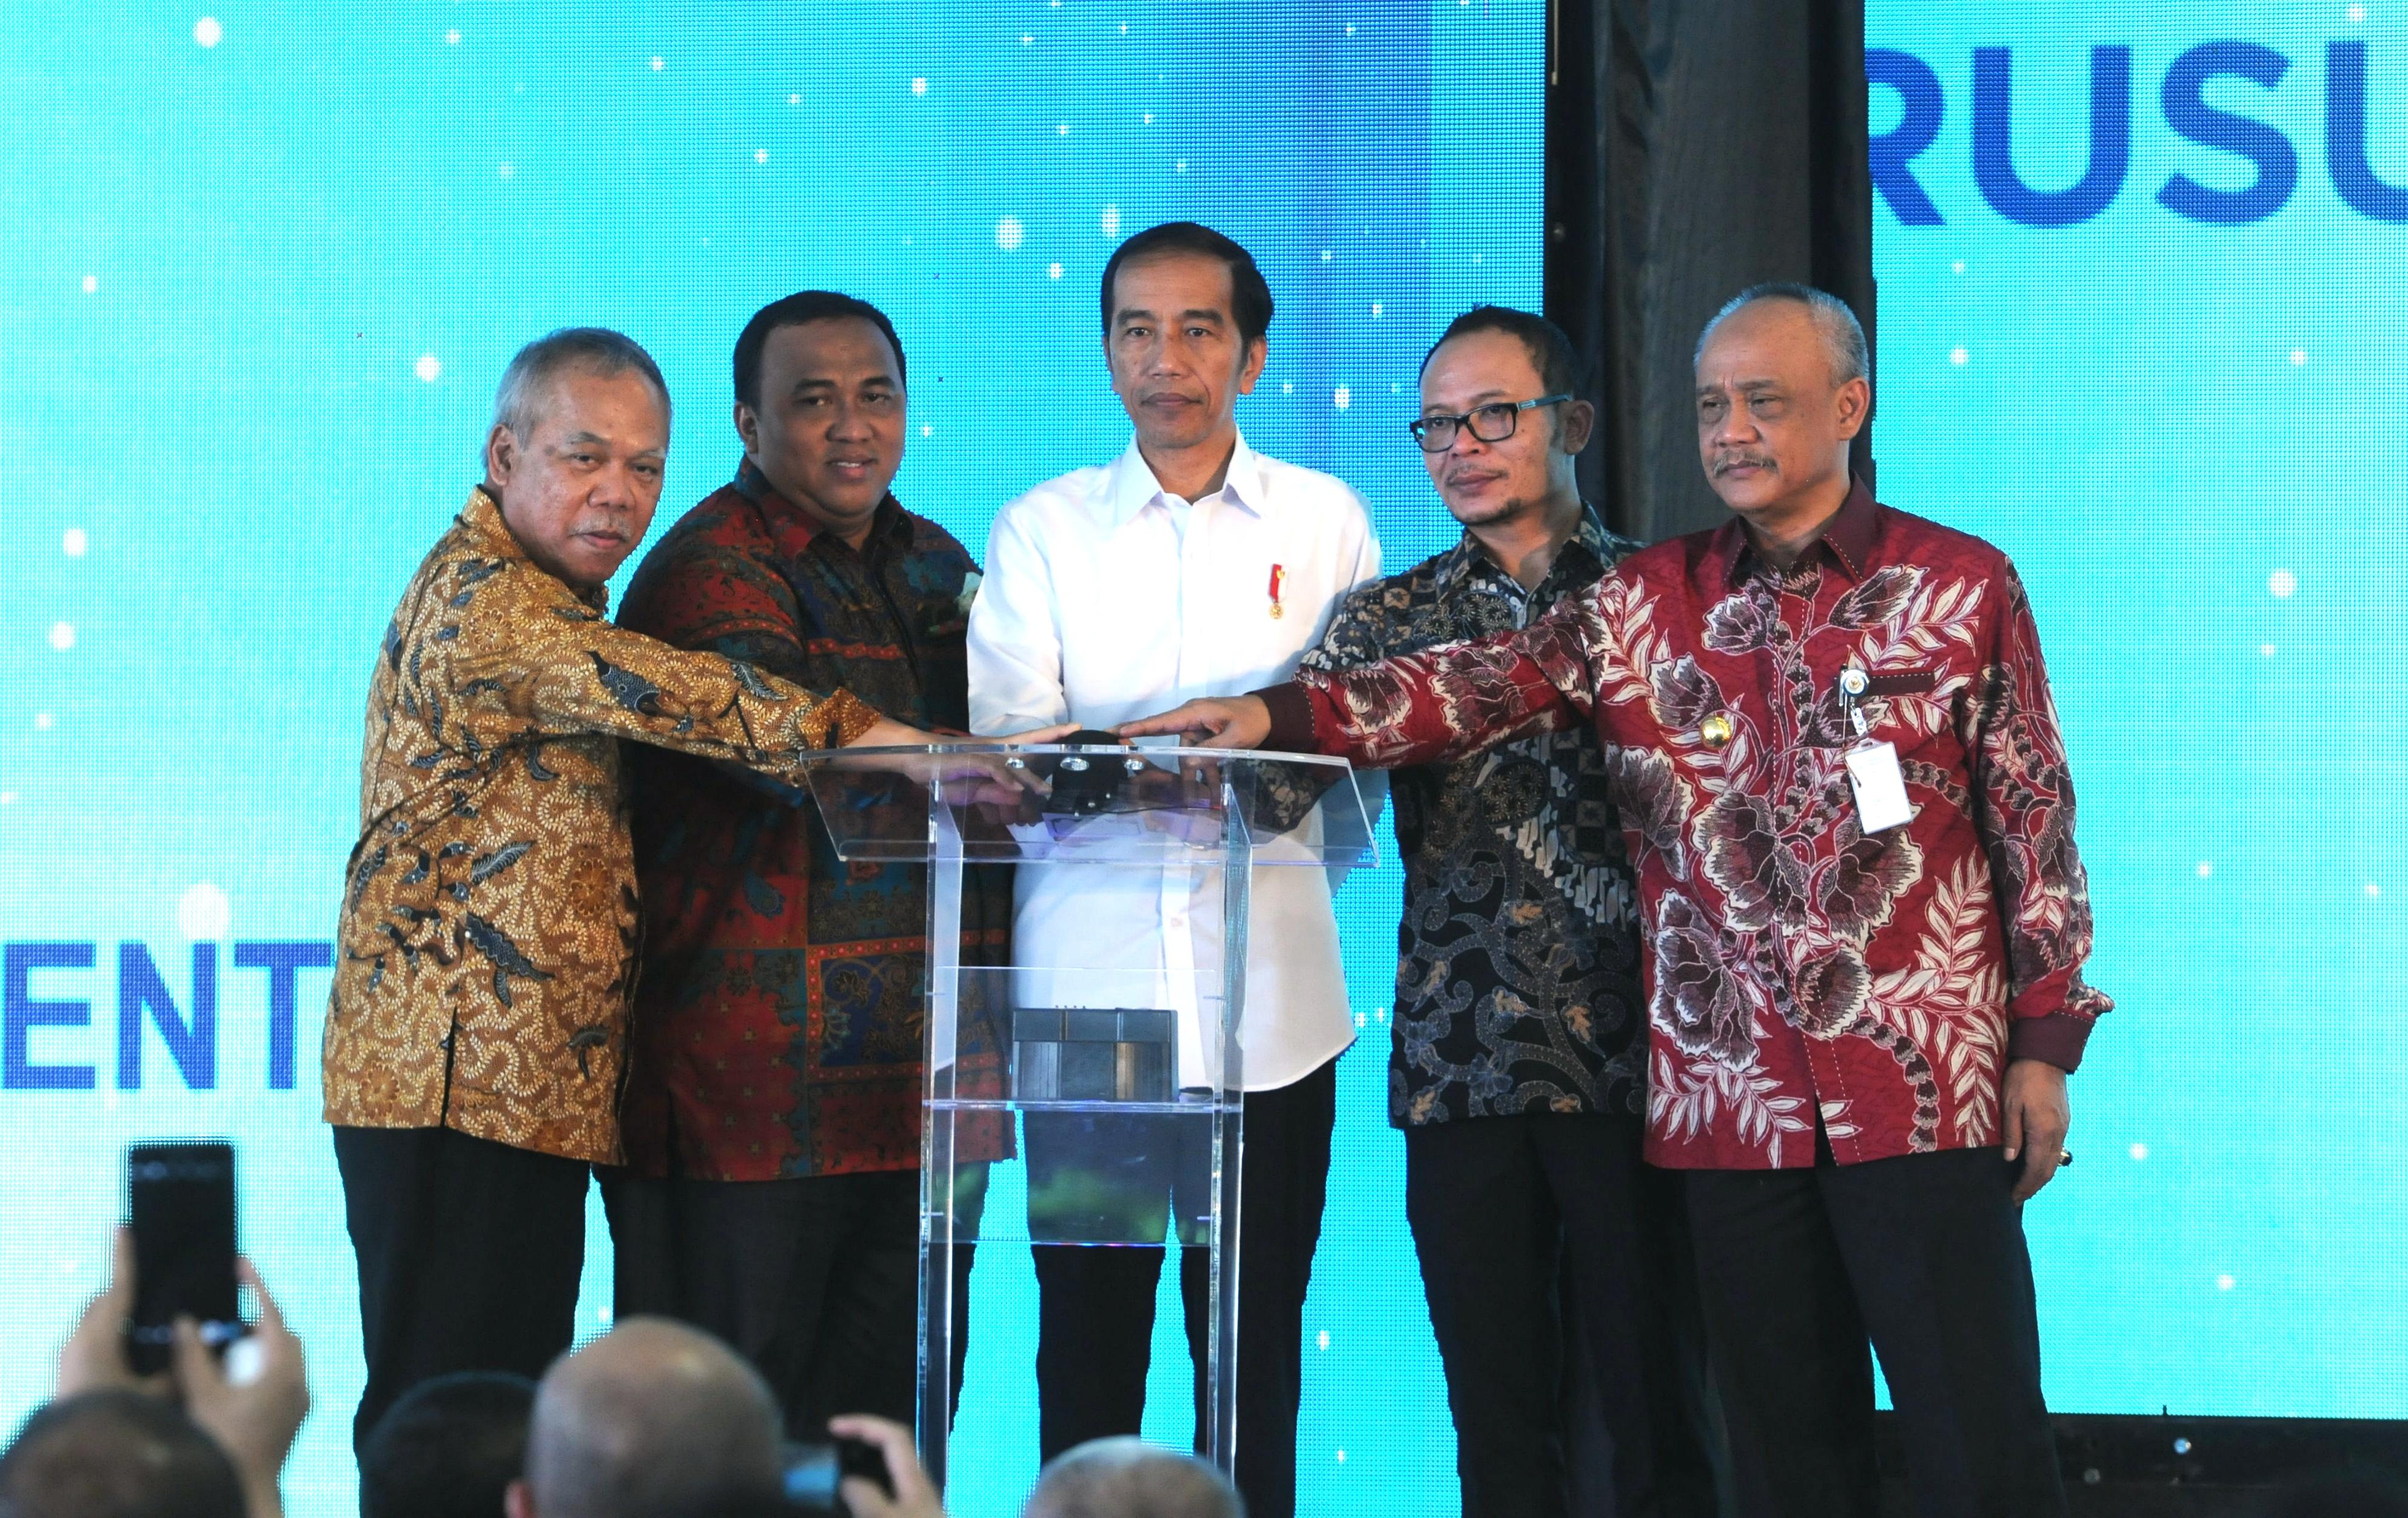 Presiden Jokowi melakukan 'Groundbreaking' Pembangunan Rusunami Masyarakat Berpenghasipan Rendah (MBR), di Urbantown-Loftvilles Serpong, Sarua, Ciputat, Tangerang Selatan, Banten, Kamis (27/4) . (Foto: Humas/Jay).